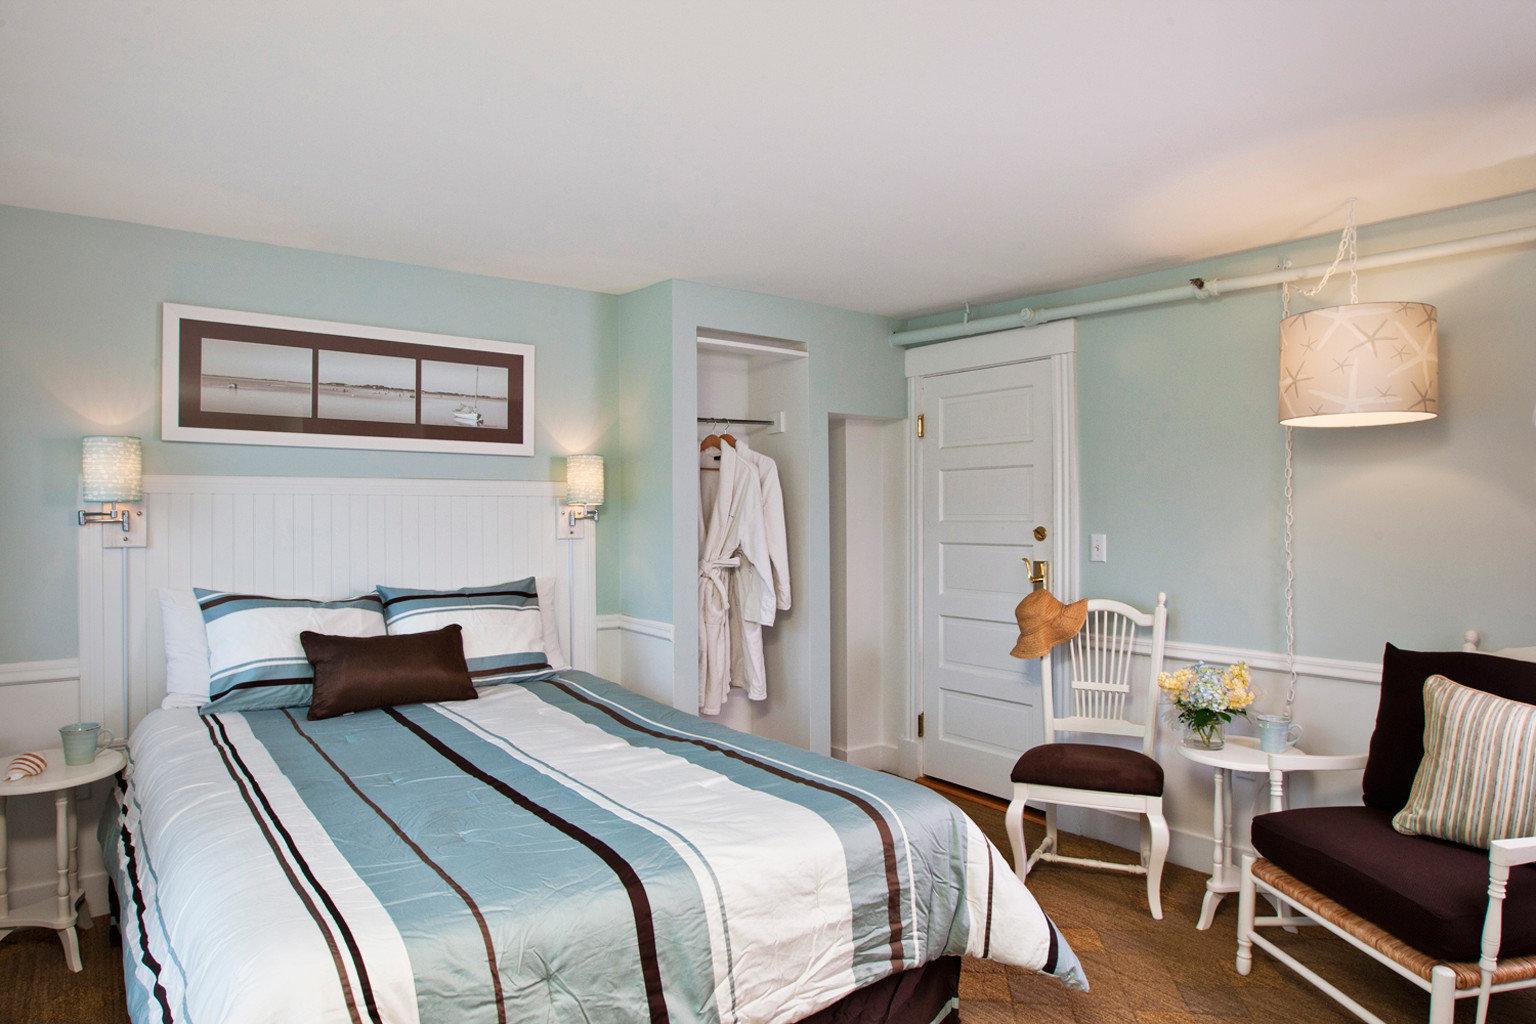 B&B Bedroom Boutique Waterfront property cottage home Suite farmhouse